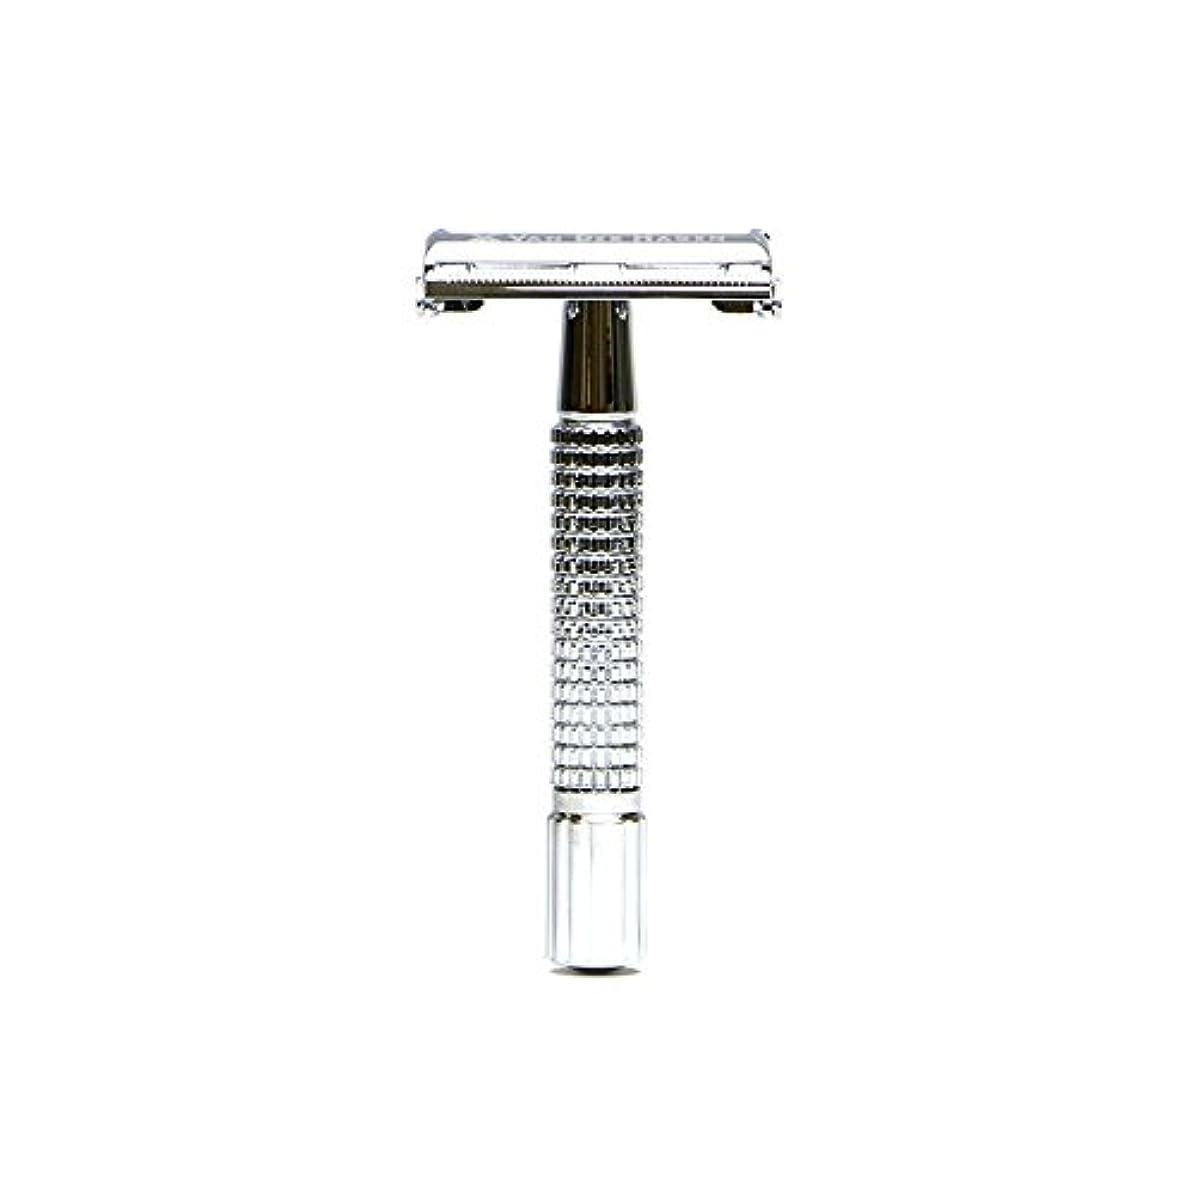 VANDERHAGEN(米) トラディショナル 安全両刃カミソリ ショートタイプ バタフライタイプ 替刃5枚付